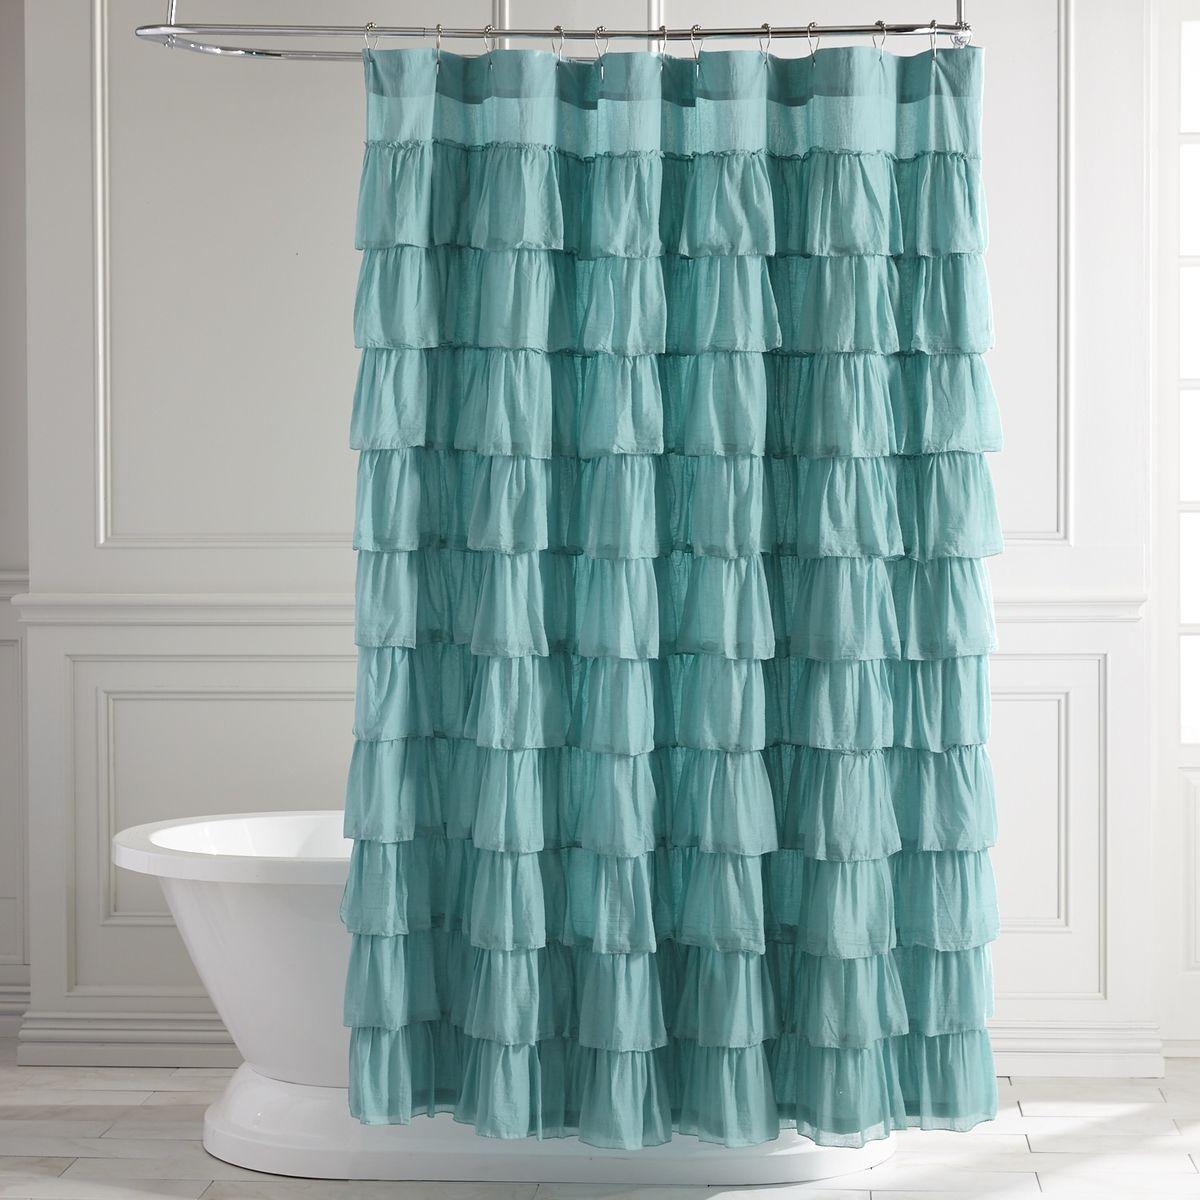 Ruffled Turquoise Shower Curtain